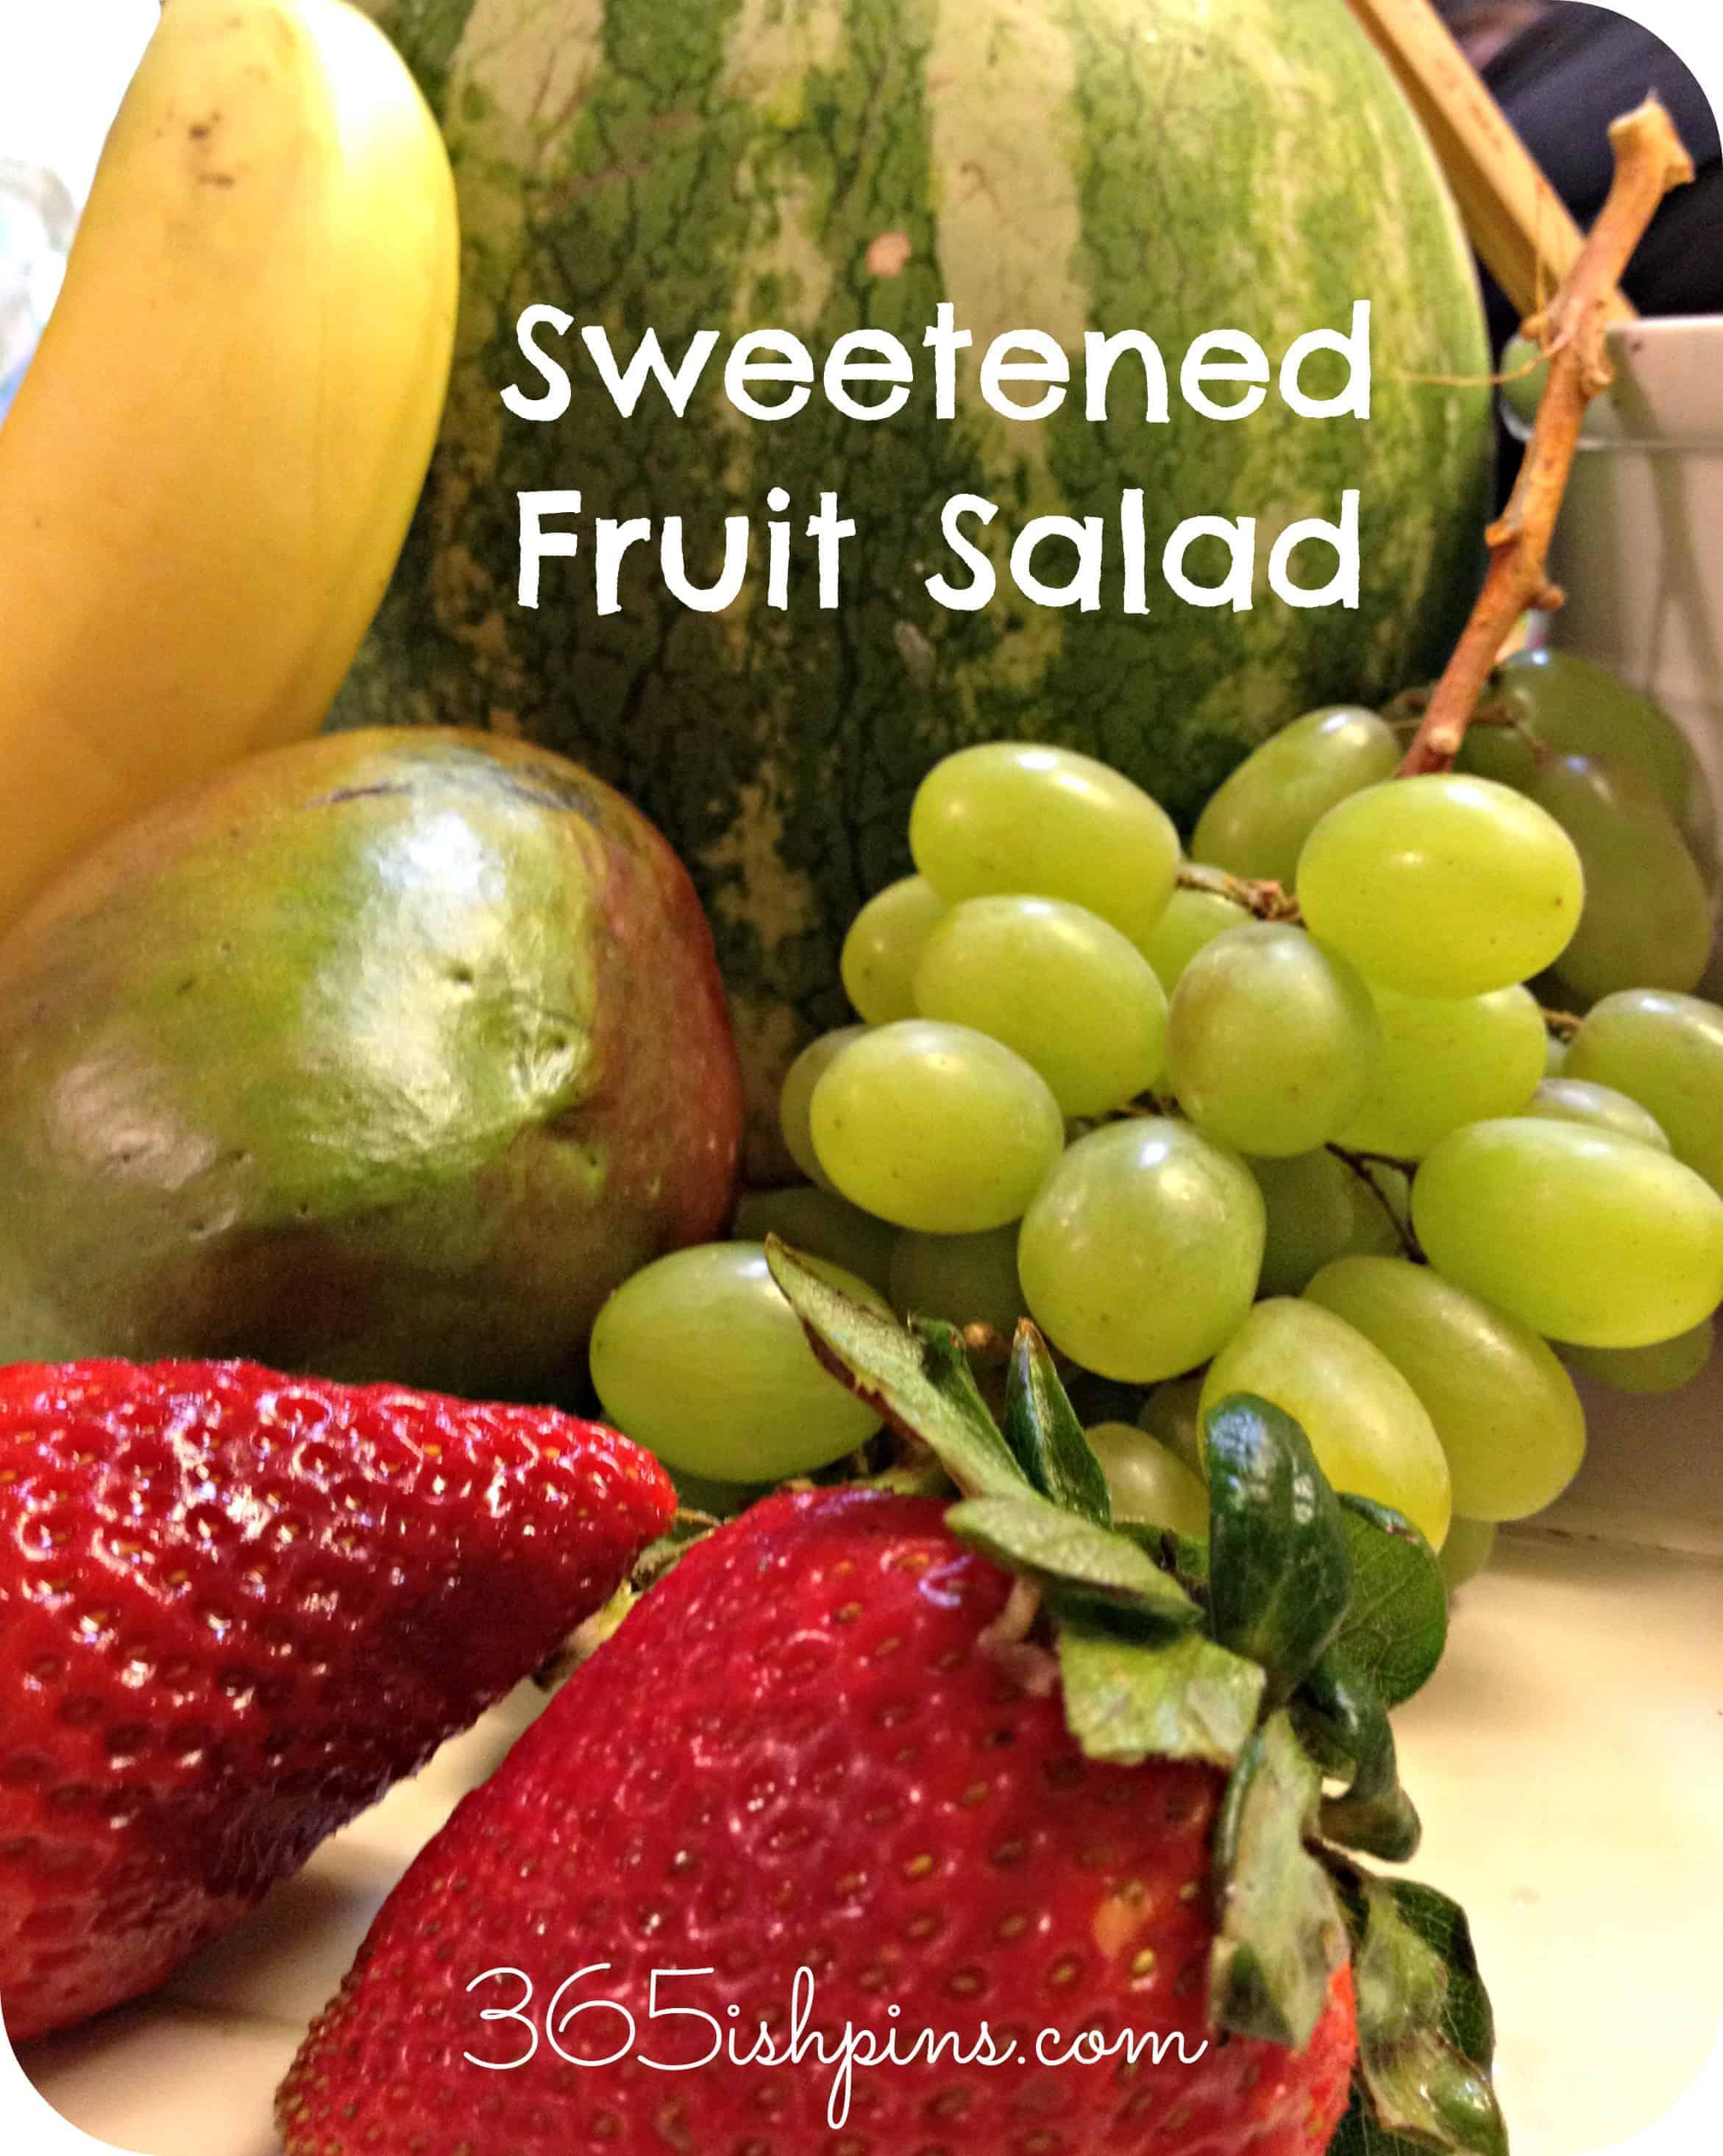 Day 334: Sweetened Fruit Salad